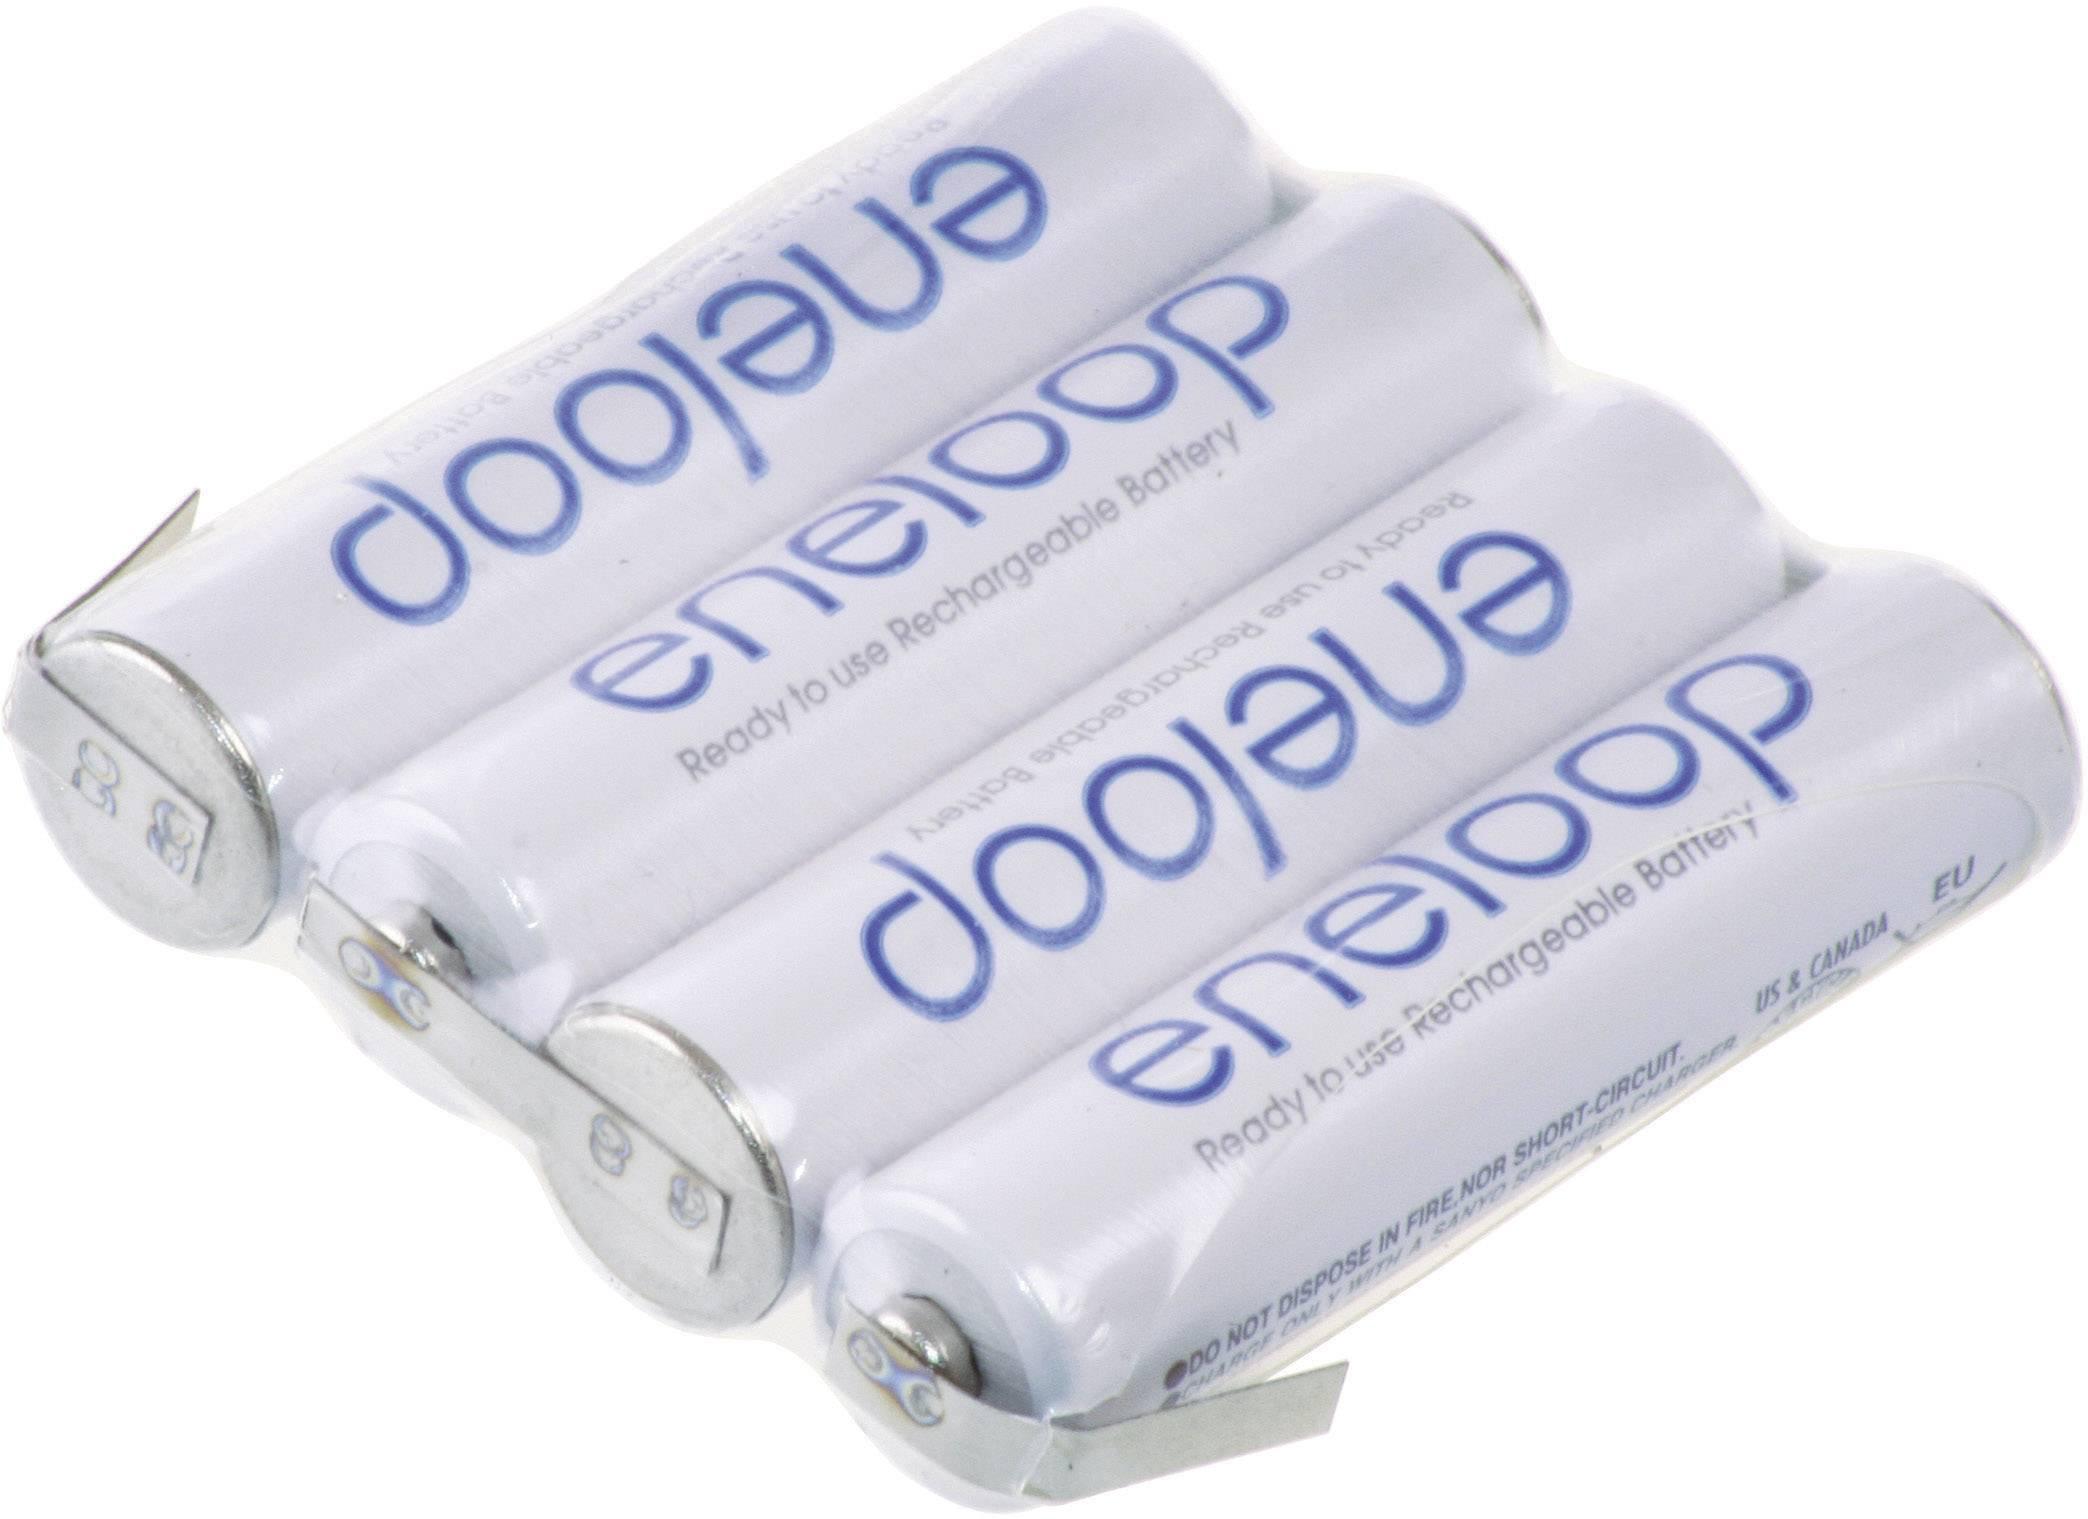 Akupack - sada nabíjacích batérií NiMH 4 micro (AAA) Panasonic eneloop Reihe F1x4 126872, 750 mAh, 4.8 V